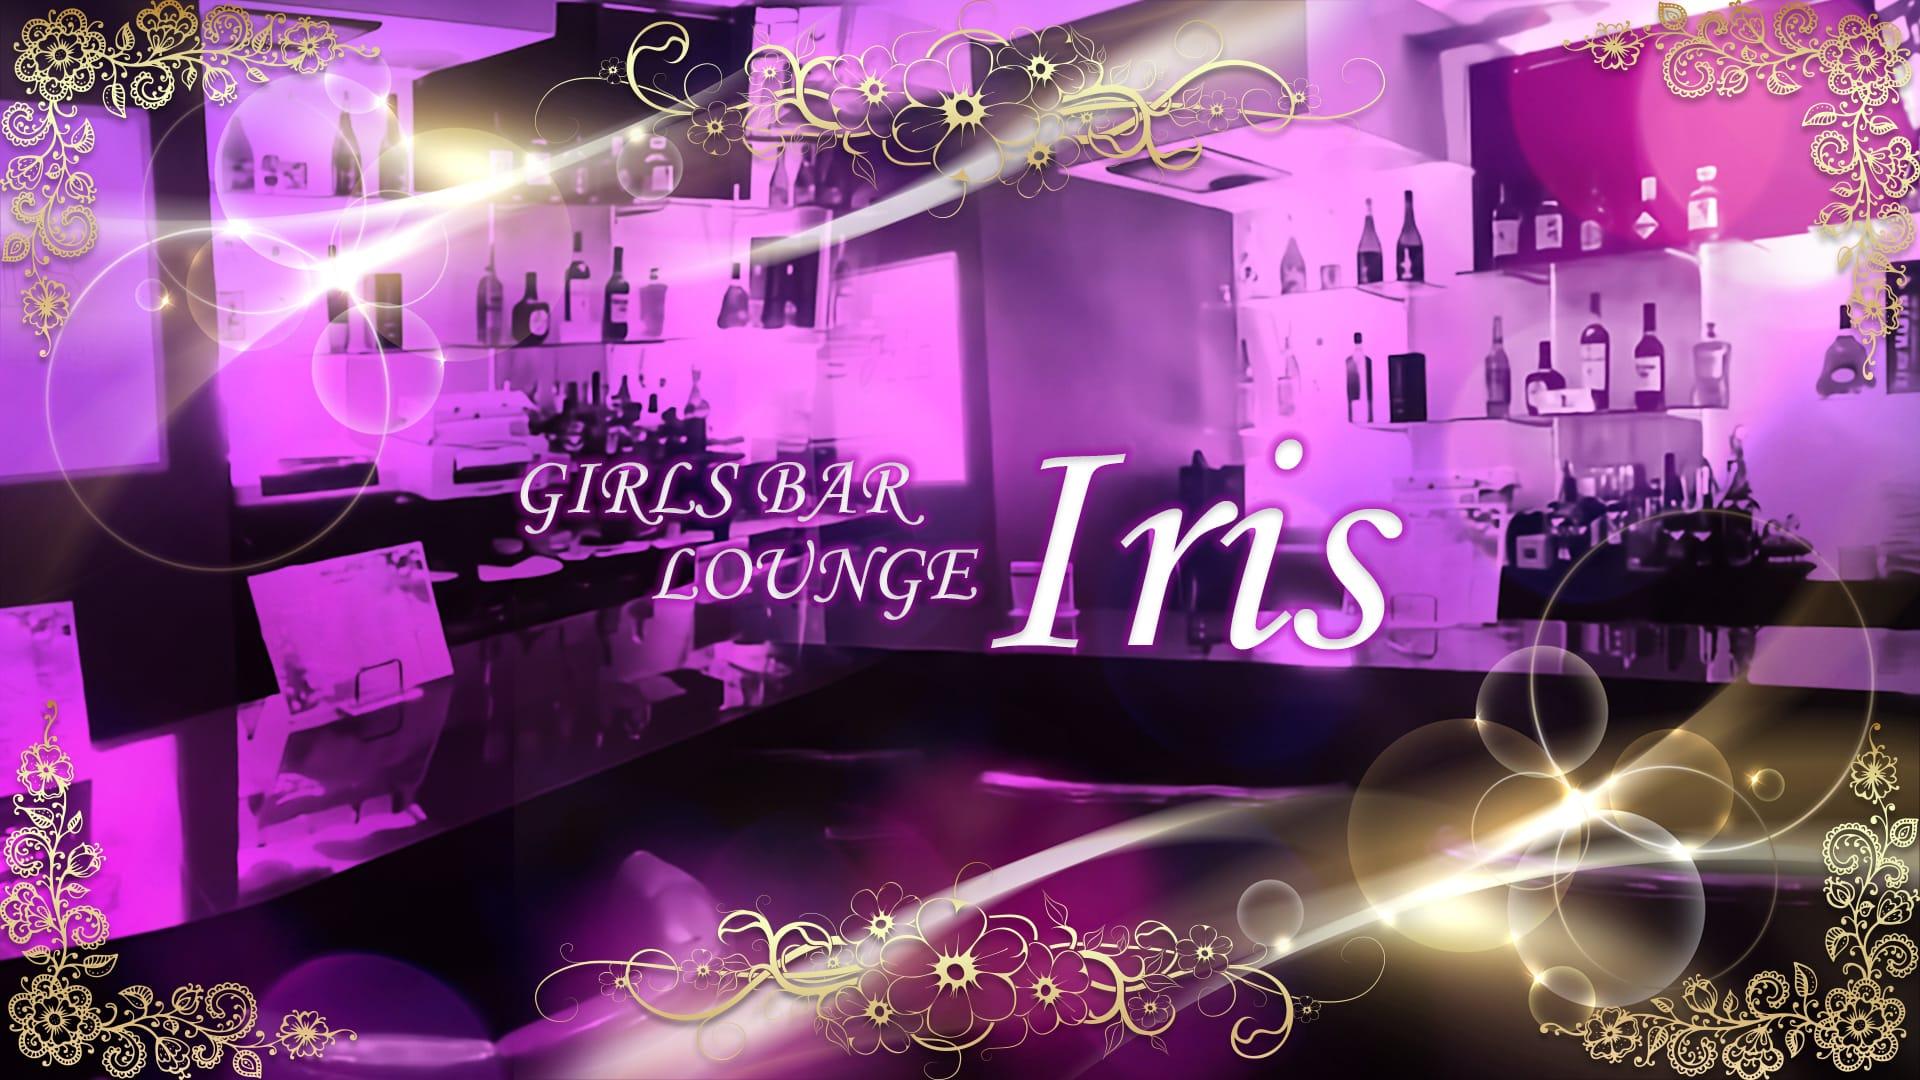 GIRLS BAR LOUNGE Iris 〜イリス〜 吉祥寺ガールズバー TOP画像